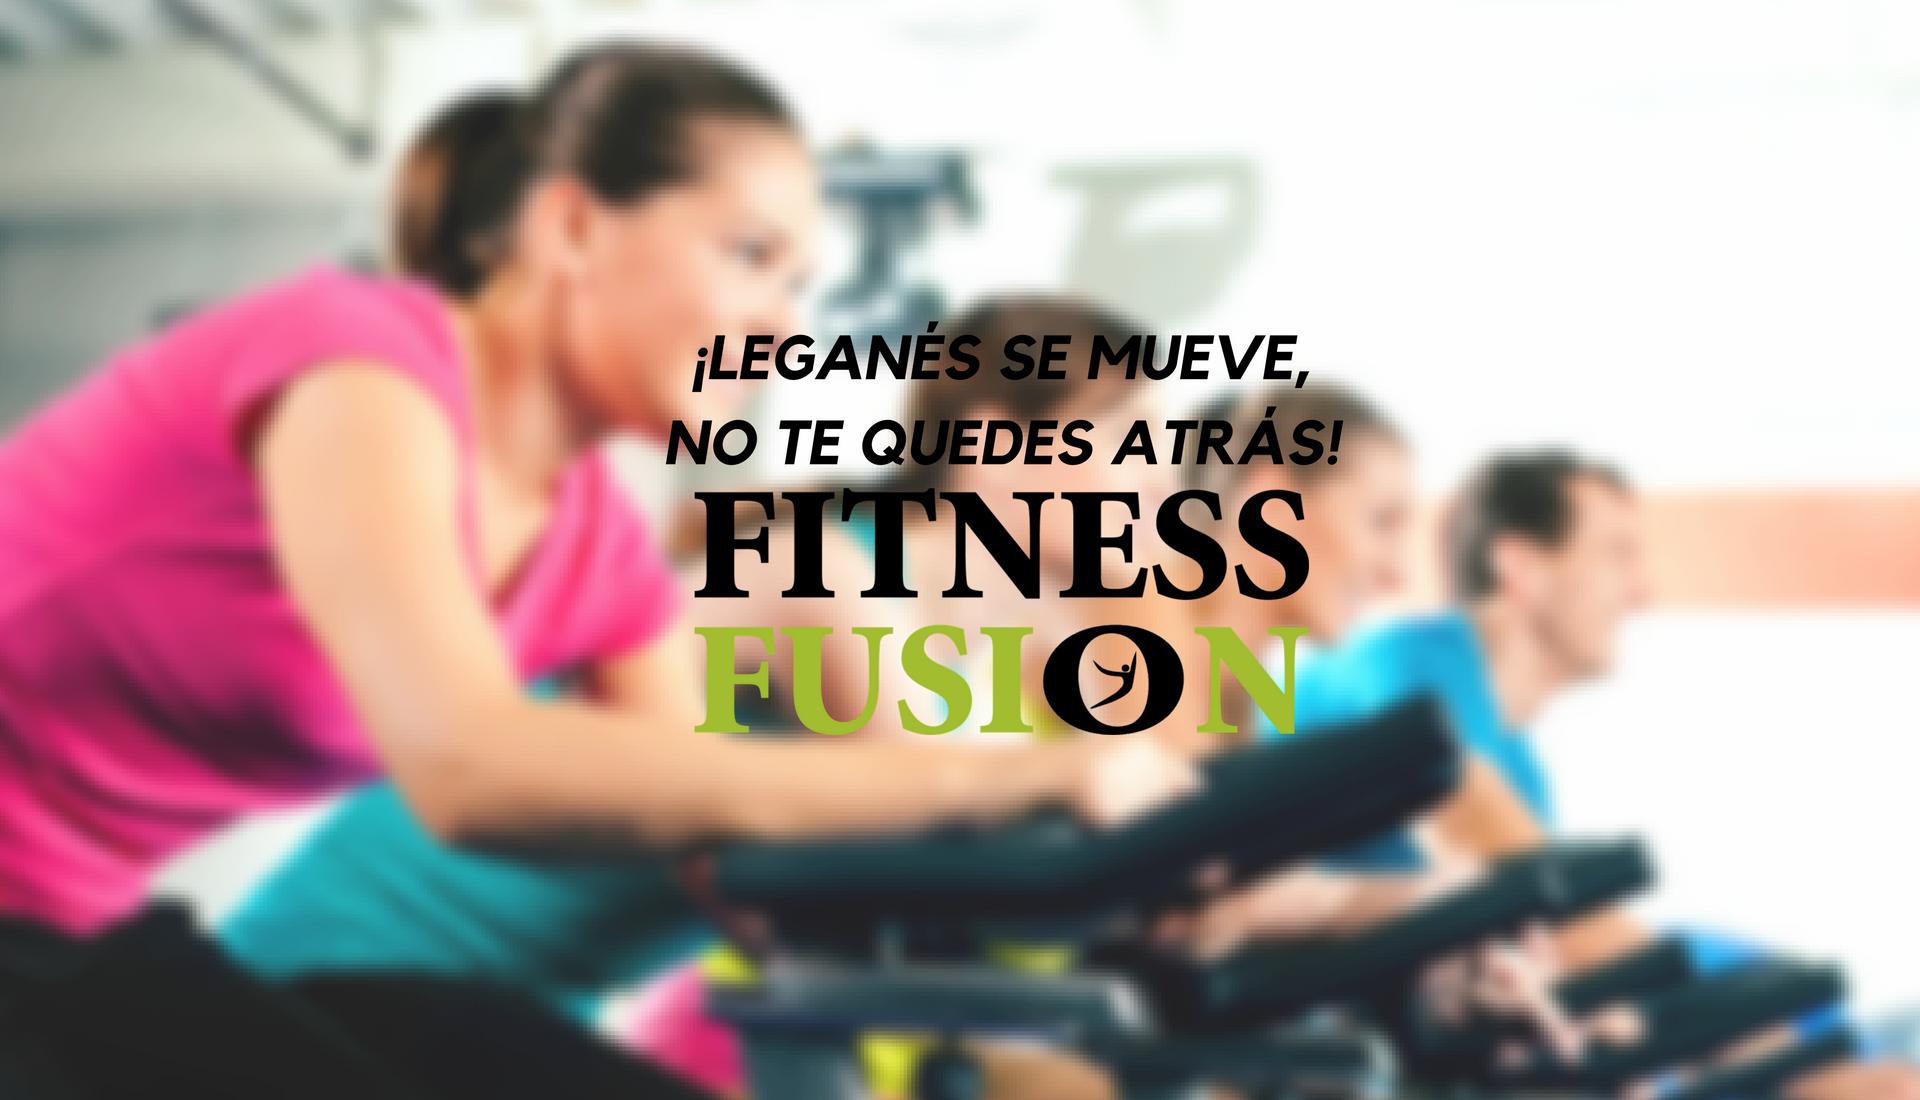 Fitnessfusion1